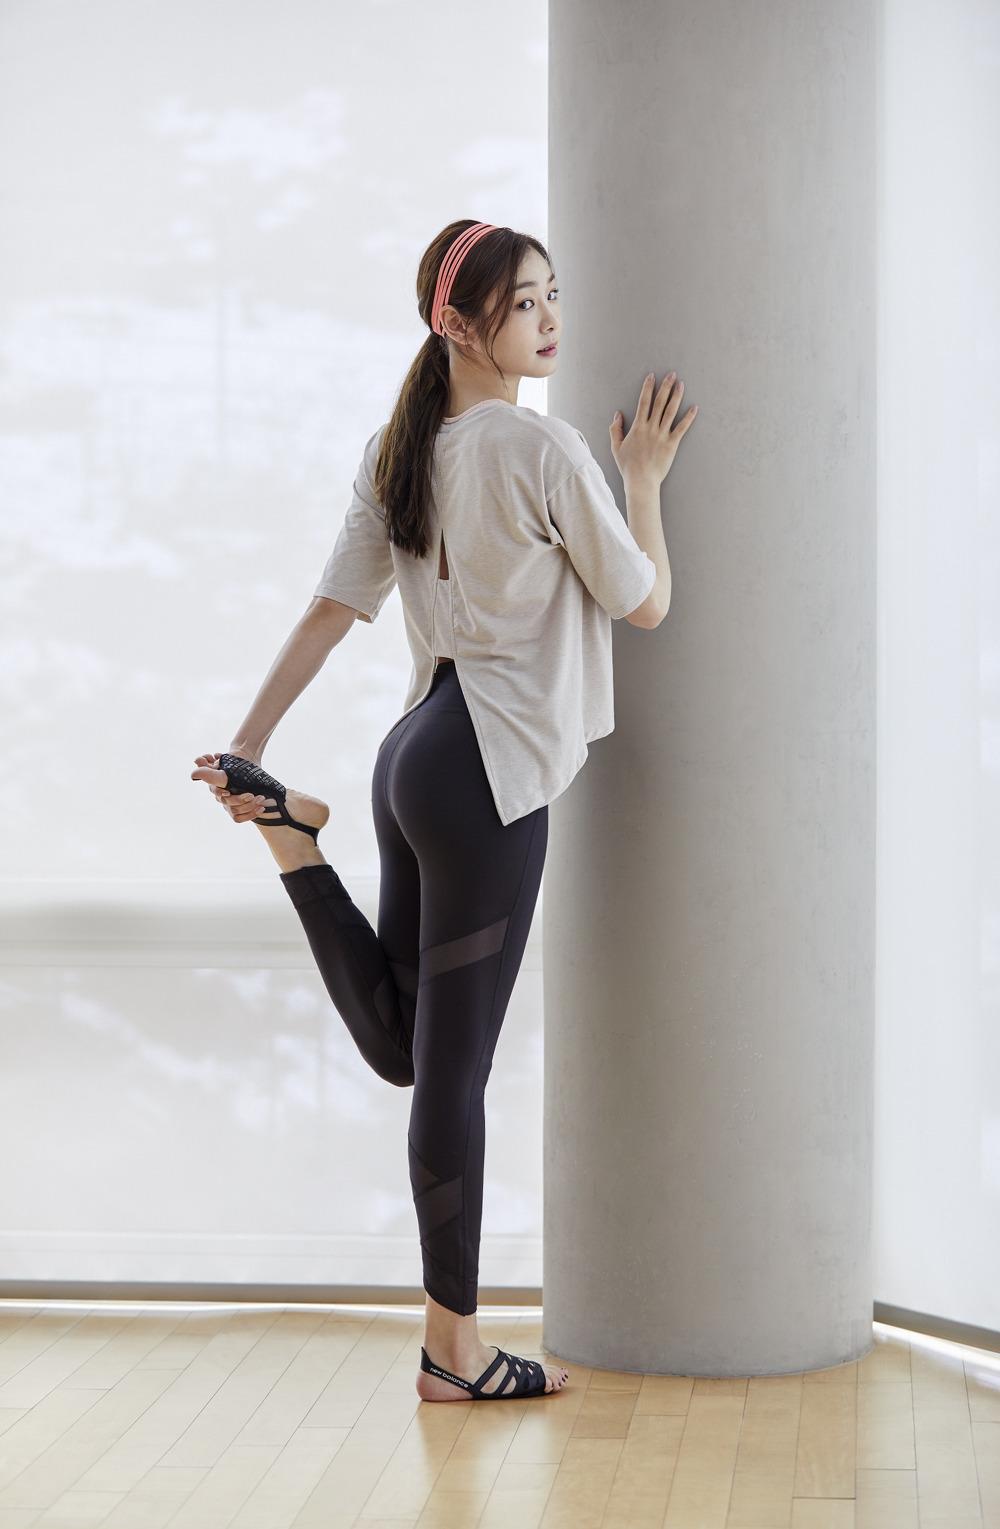 newBalance 2018ss Yuna Kim_13_WOMEN 이볼브 타이츠